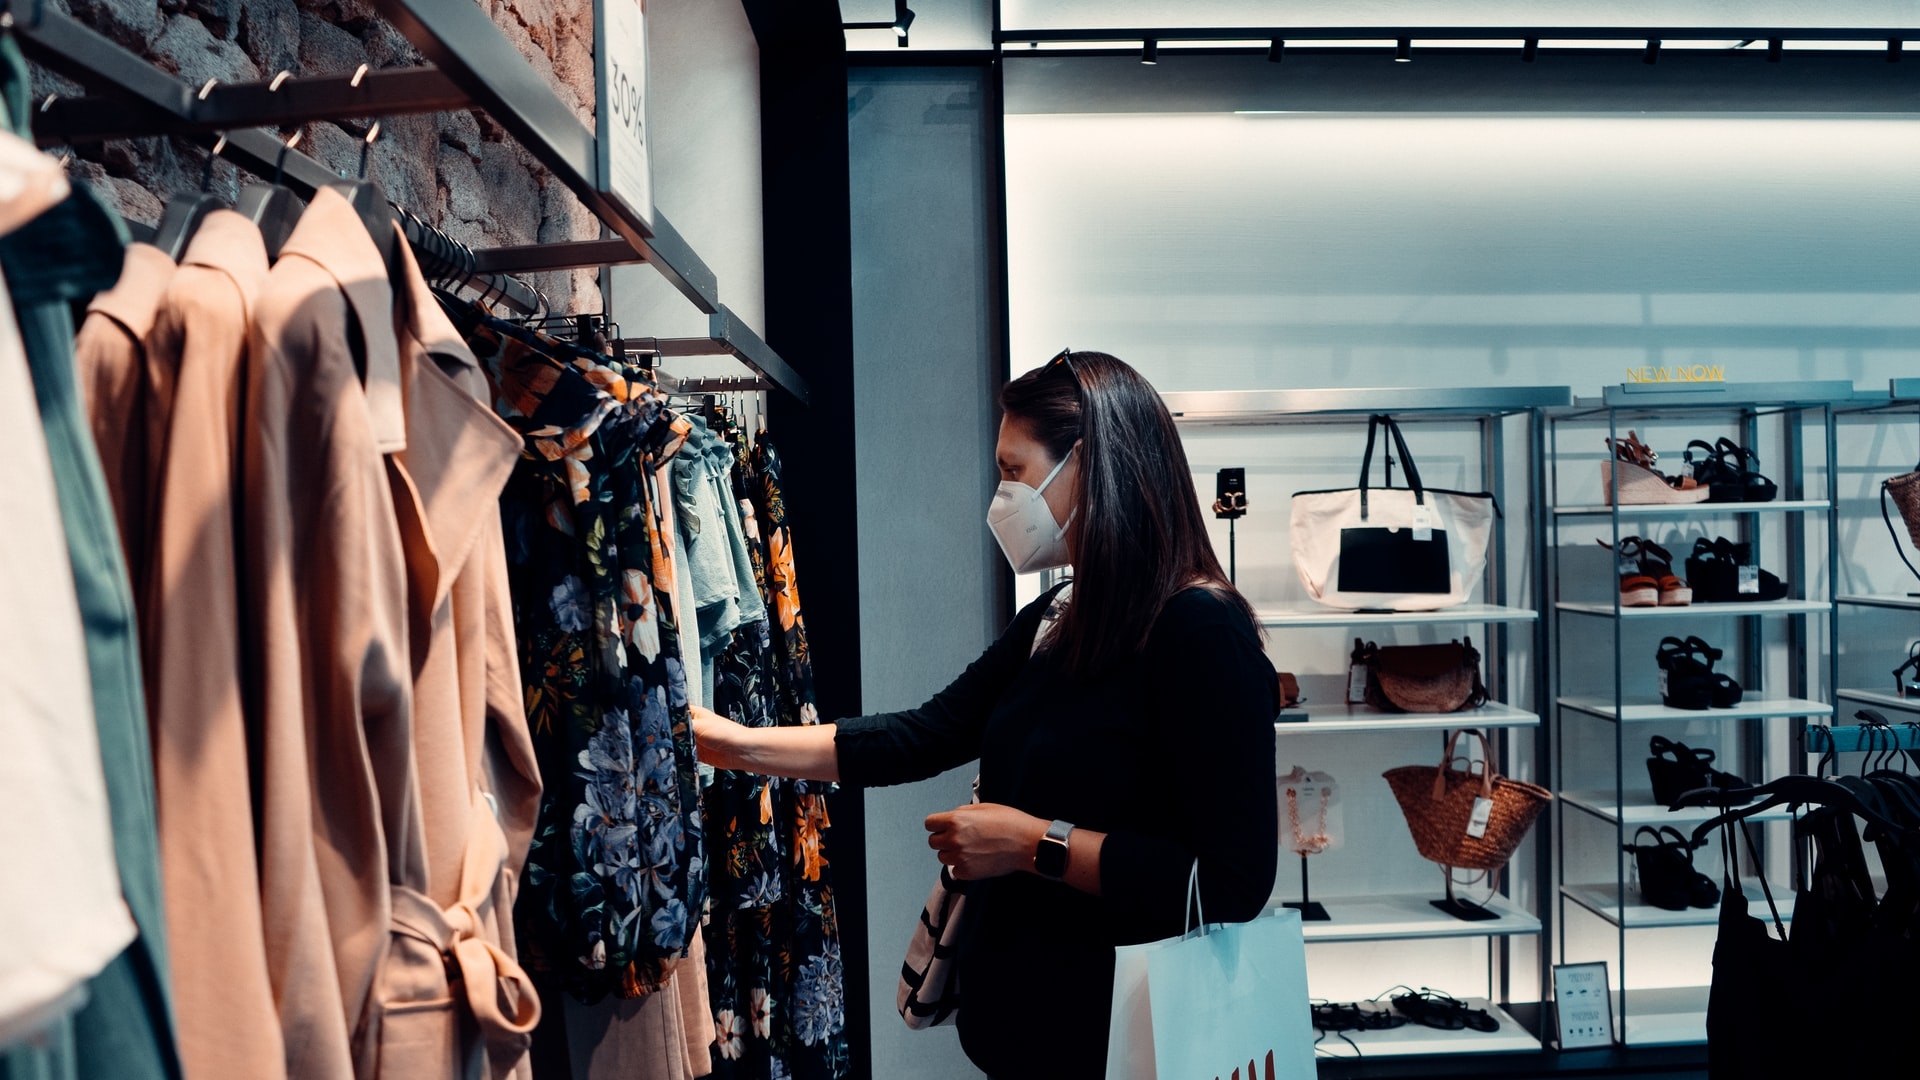 Koopr-vêtements-achat-ArturoRey-Unsplash